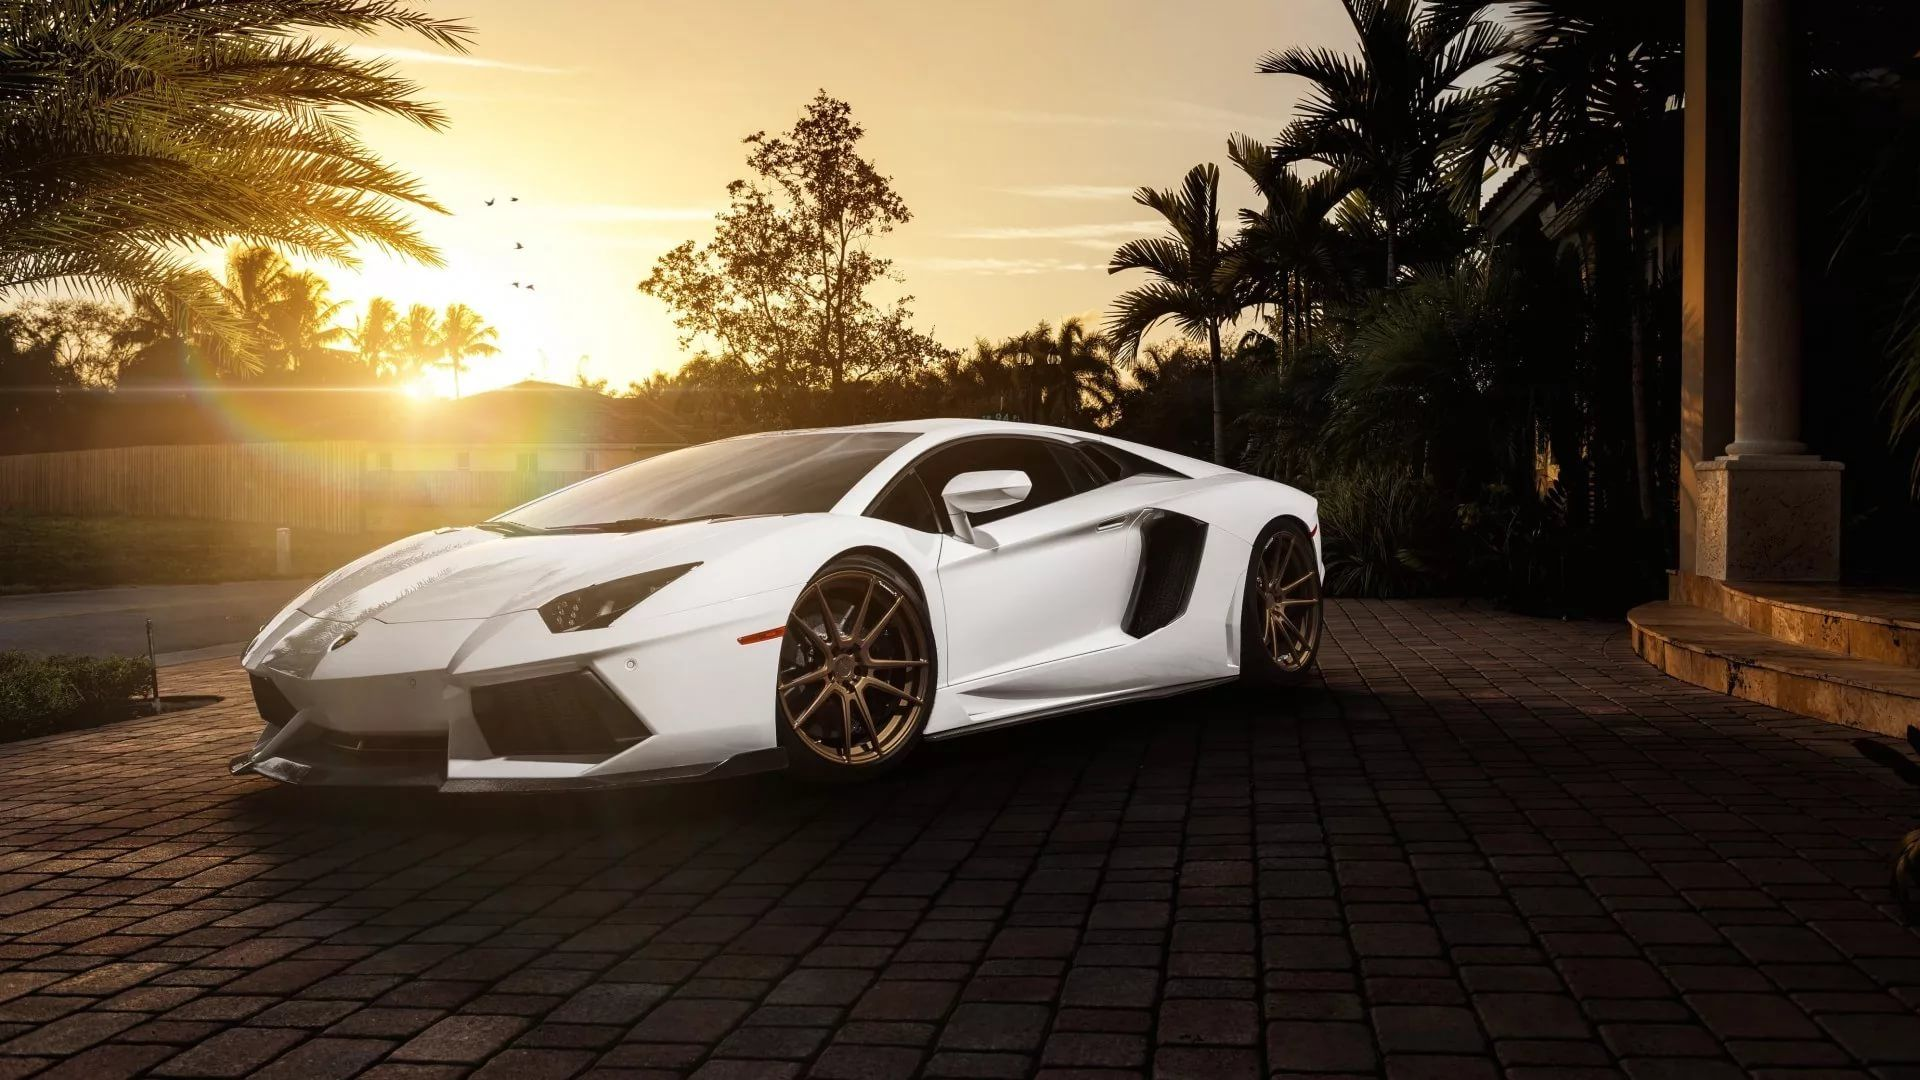 Lamborghini High Quality